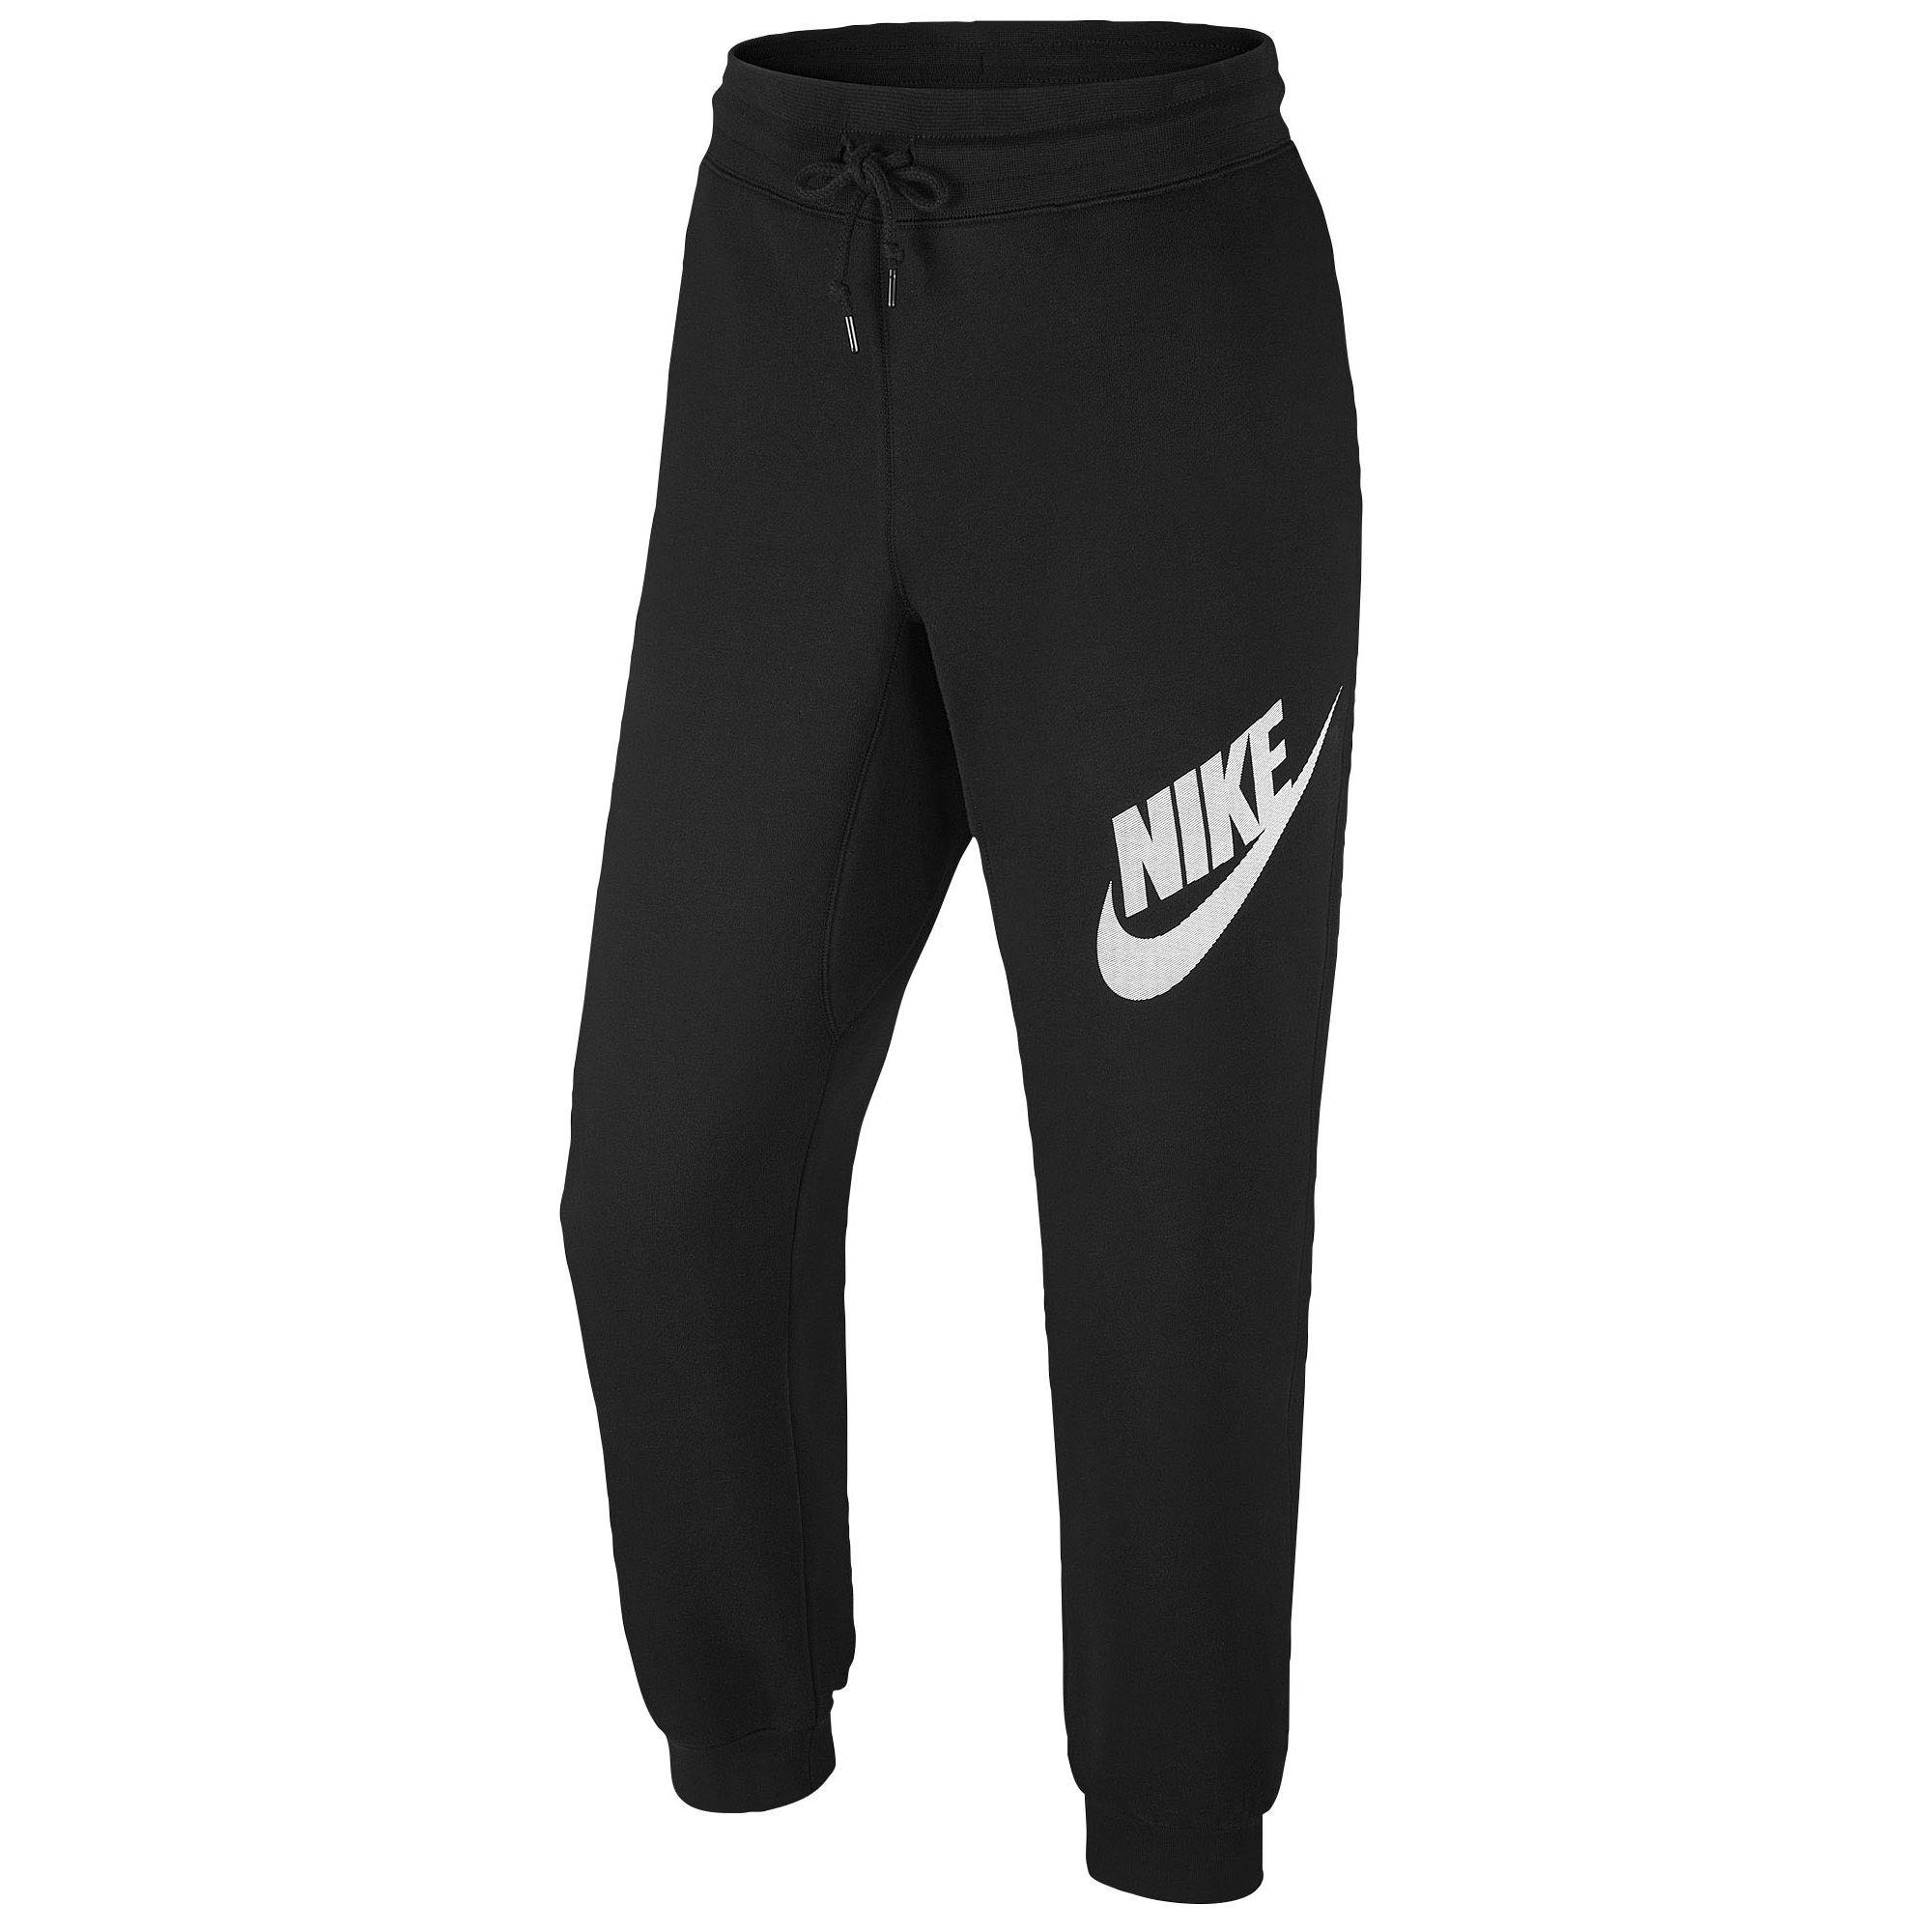 4e21f0a285d1b5 Nike AW77 Fleece Cuff Pants Logo26 - Men s - Clothing